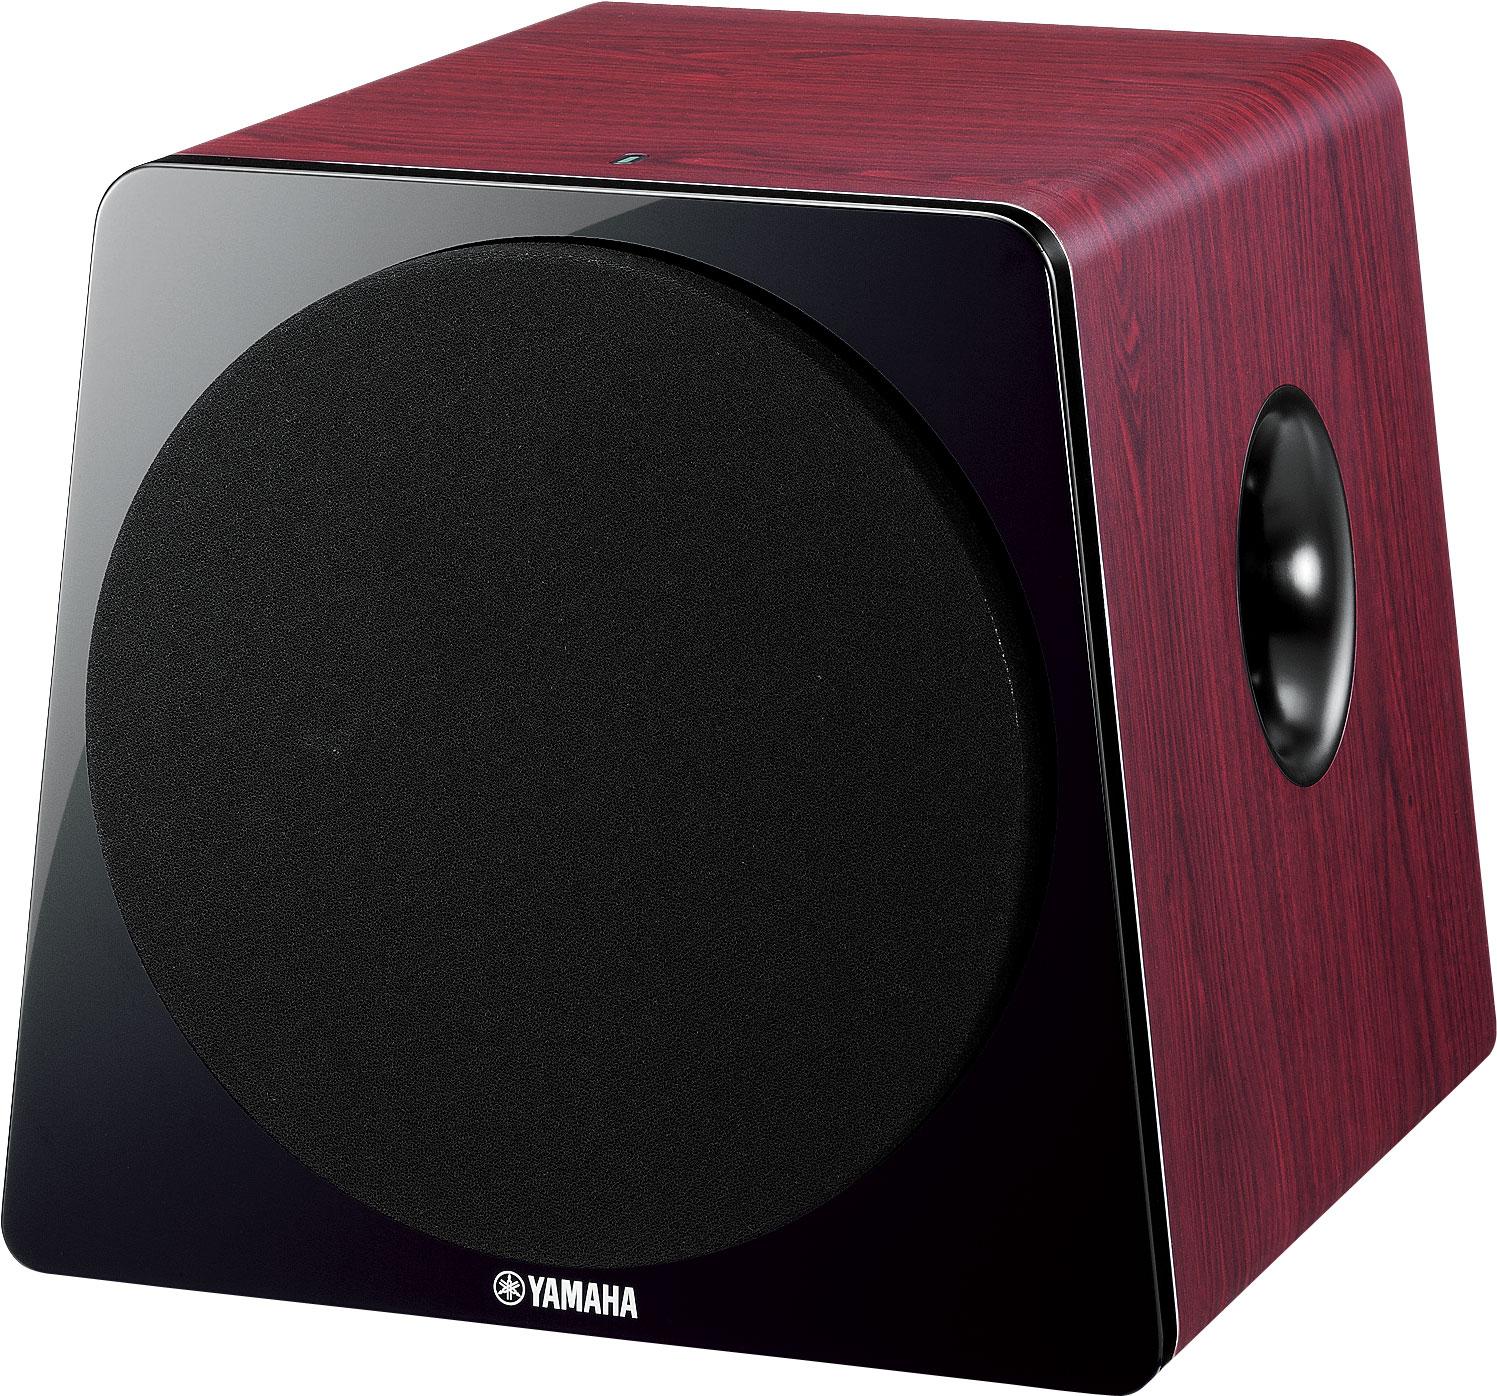 Yamaha Speaker Indonesia